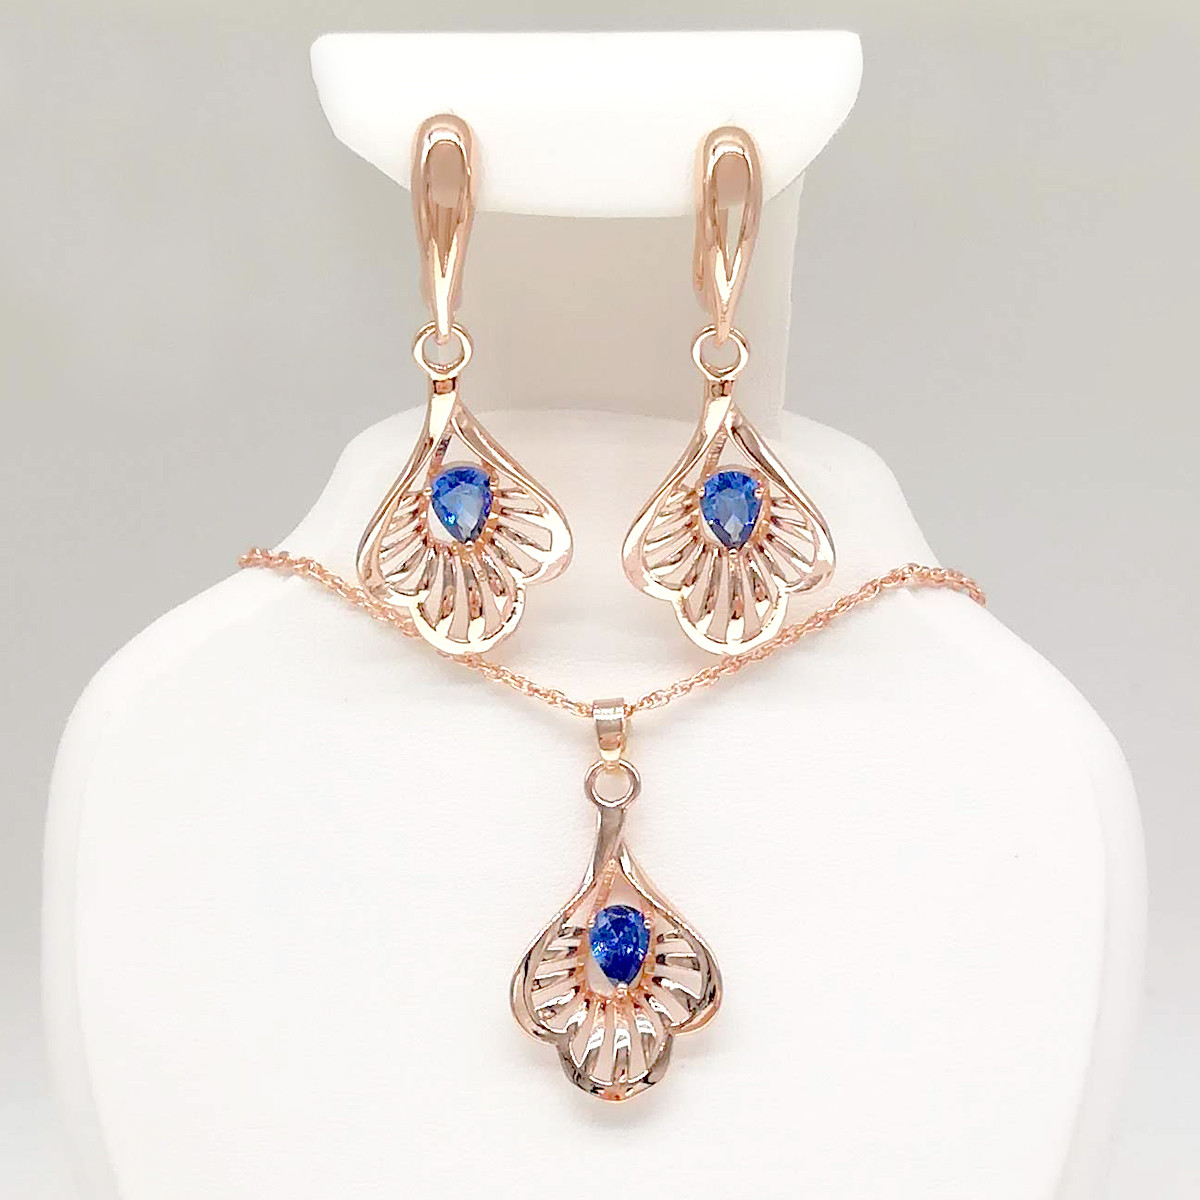 Набор из медицинского золота, синие фианиты, позолота PO, 73858             (1)